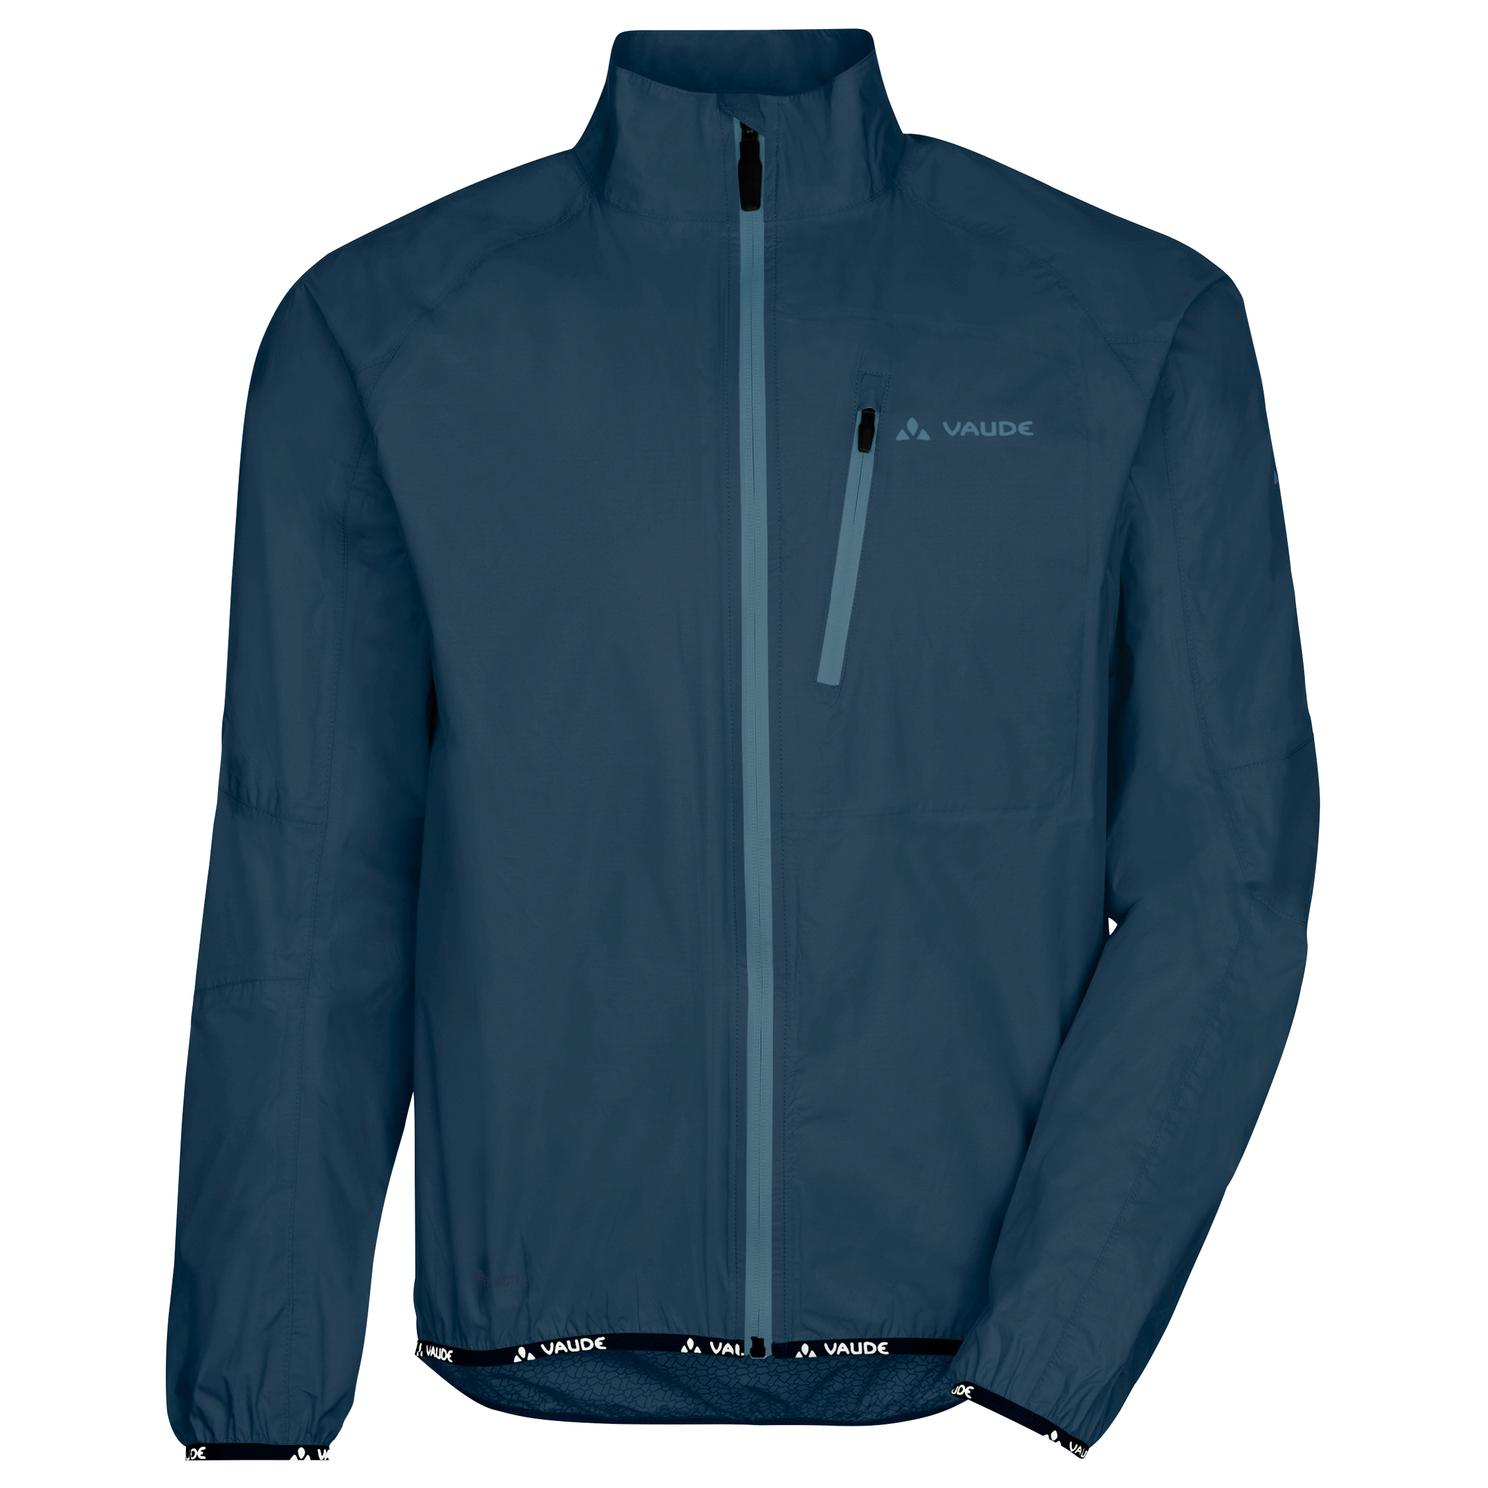 vaude drop jacket iii bike jacket men 39 s free eu. Black Bedroom Furniture Sets. Home Design Ideas